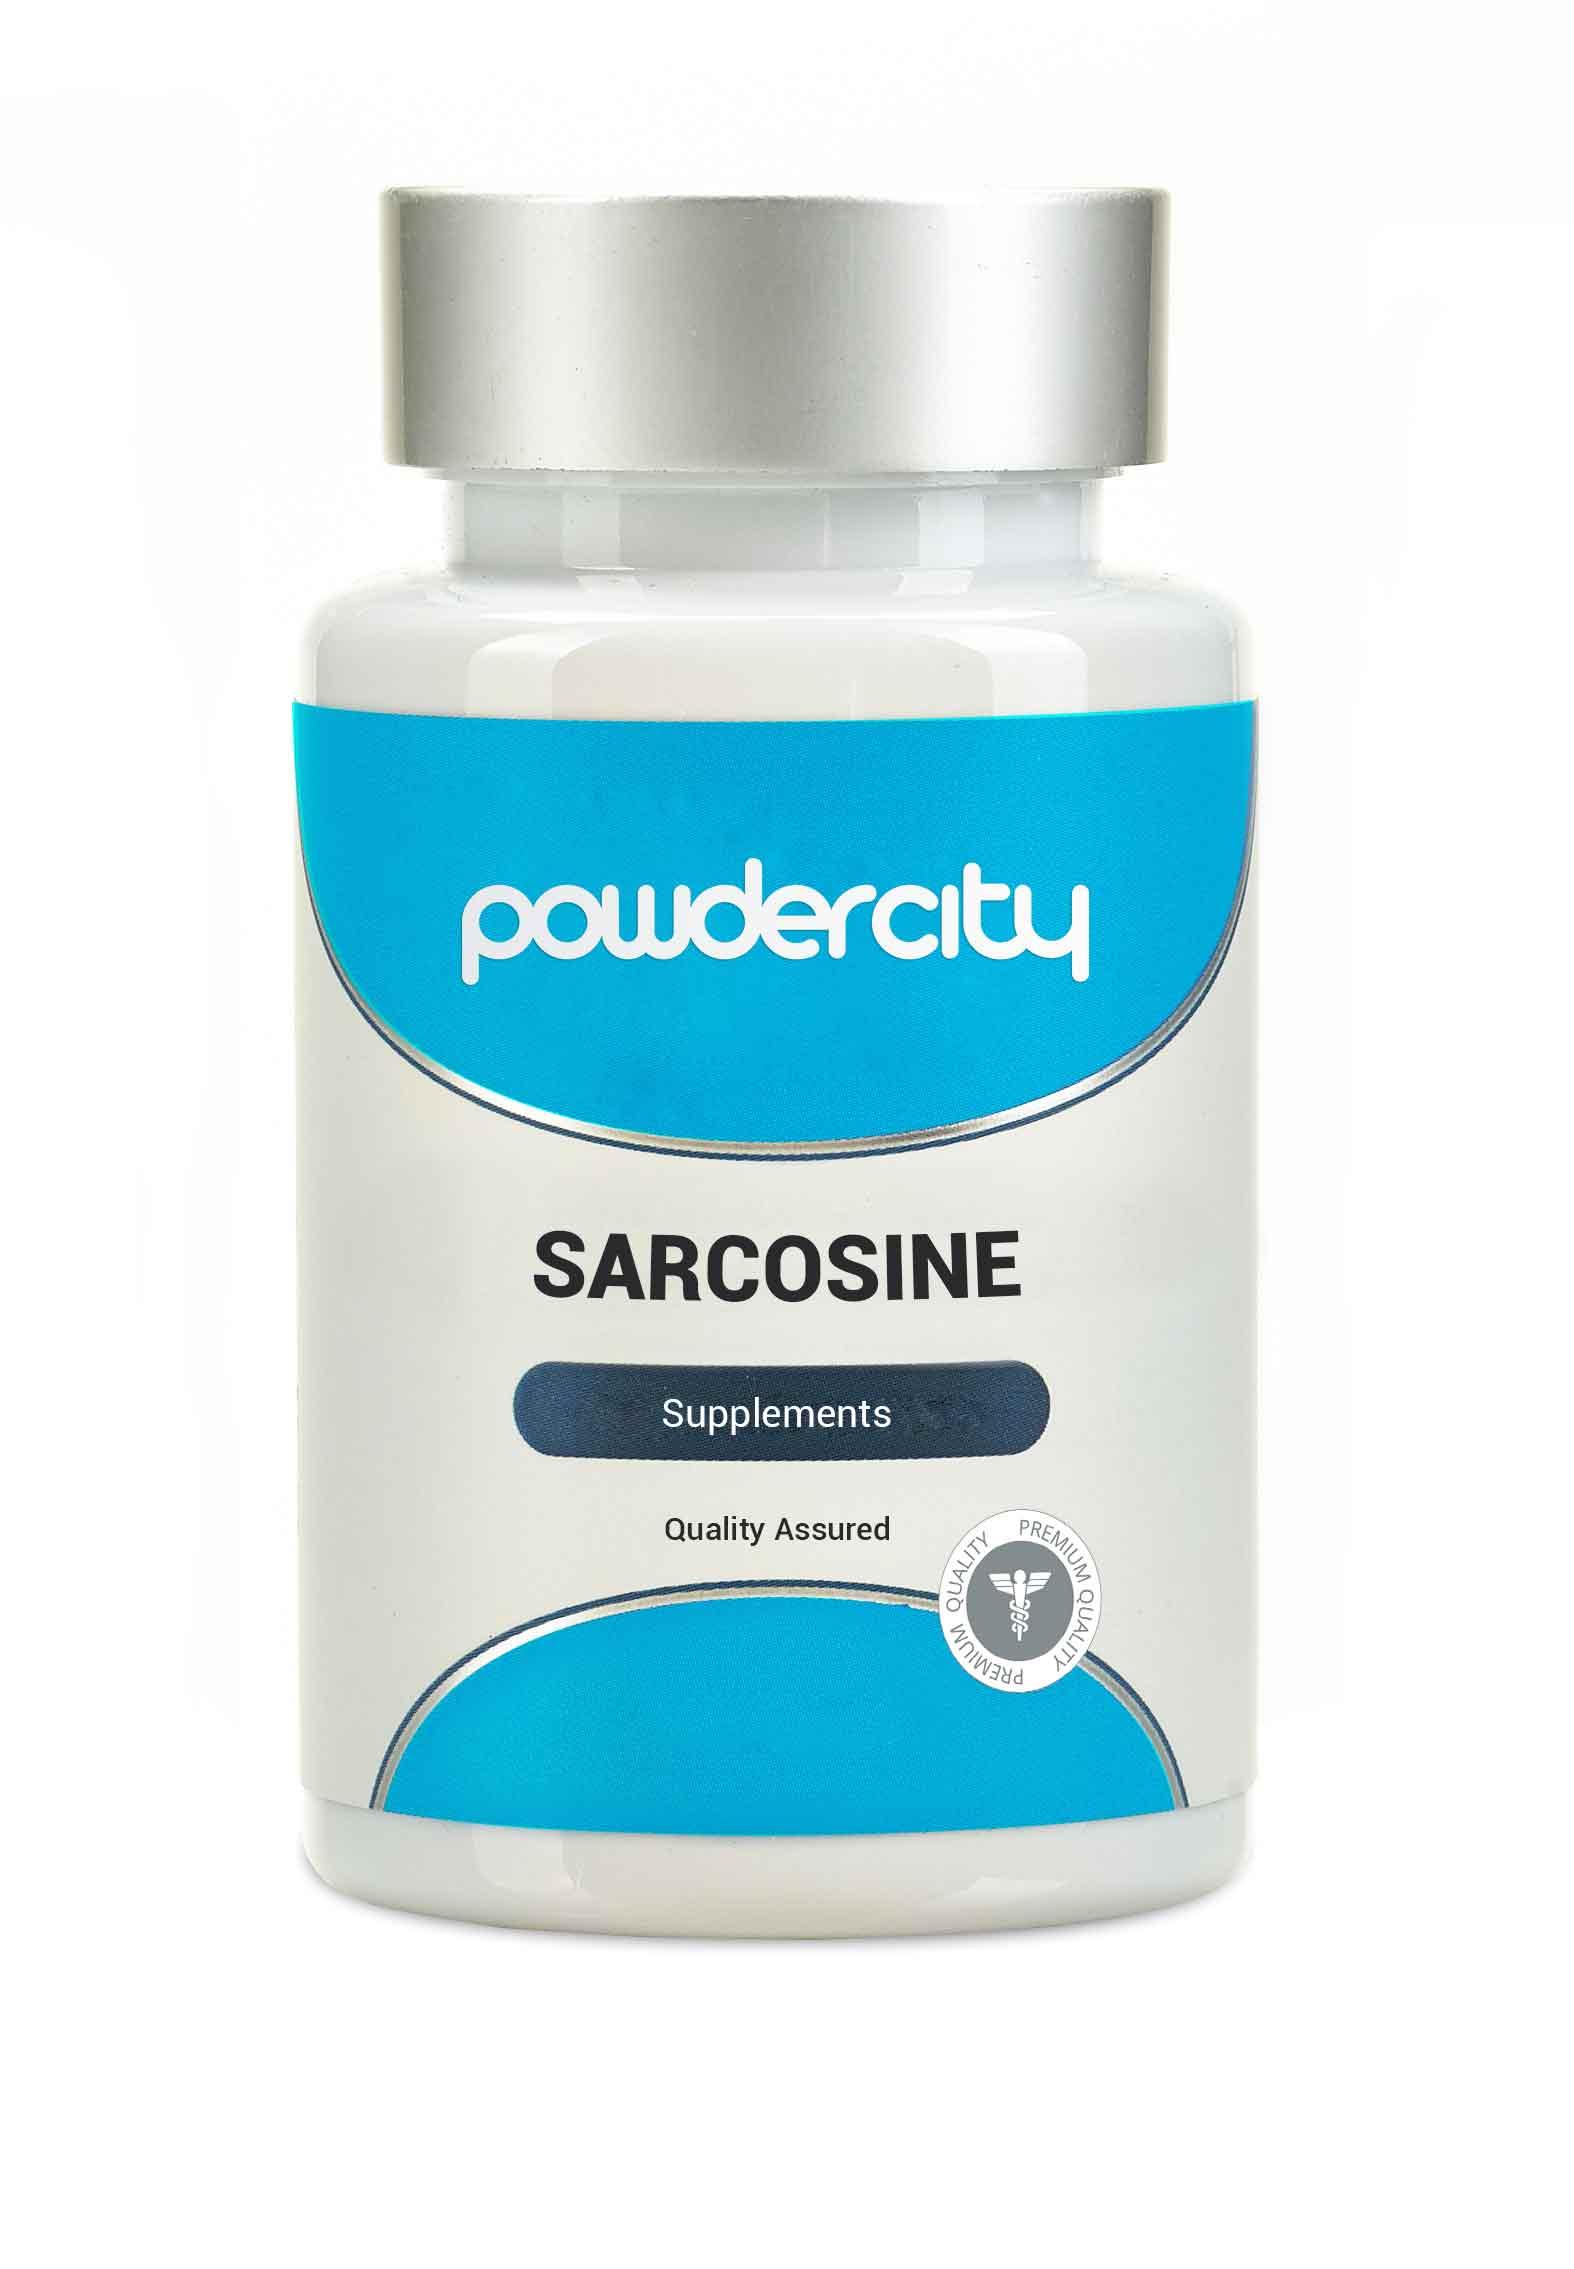 Sarcosine Online - Effects, Dosage, Side Effects, Benefits